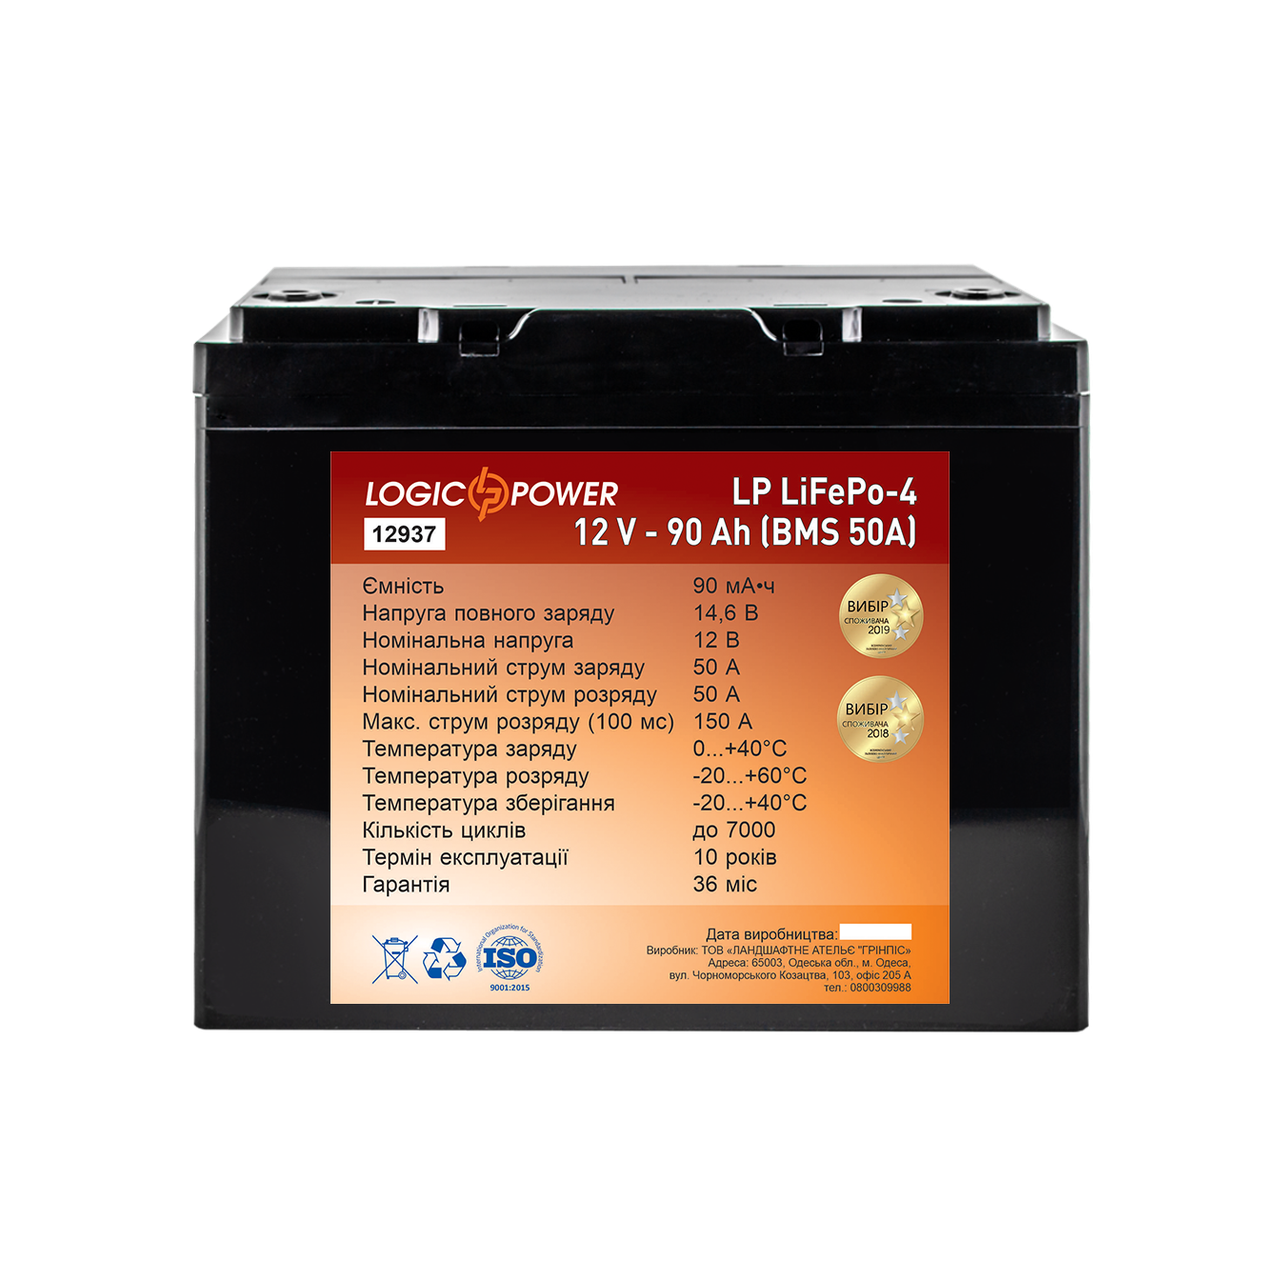 Аккумулятор LP LiFePO4 12V - 90 Ah (BMS 50A) пластик